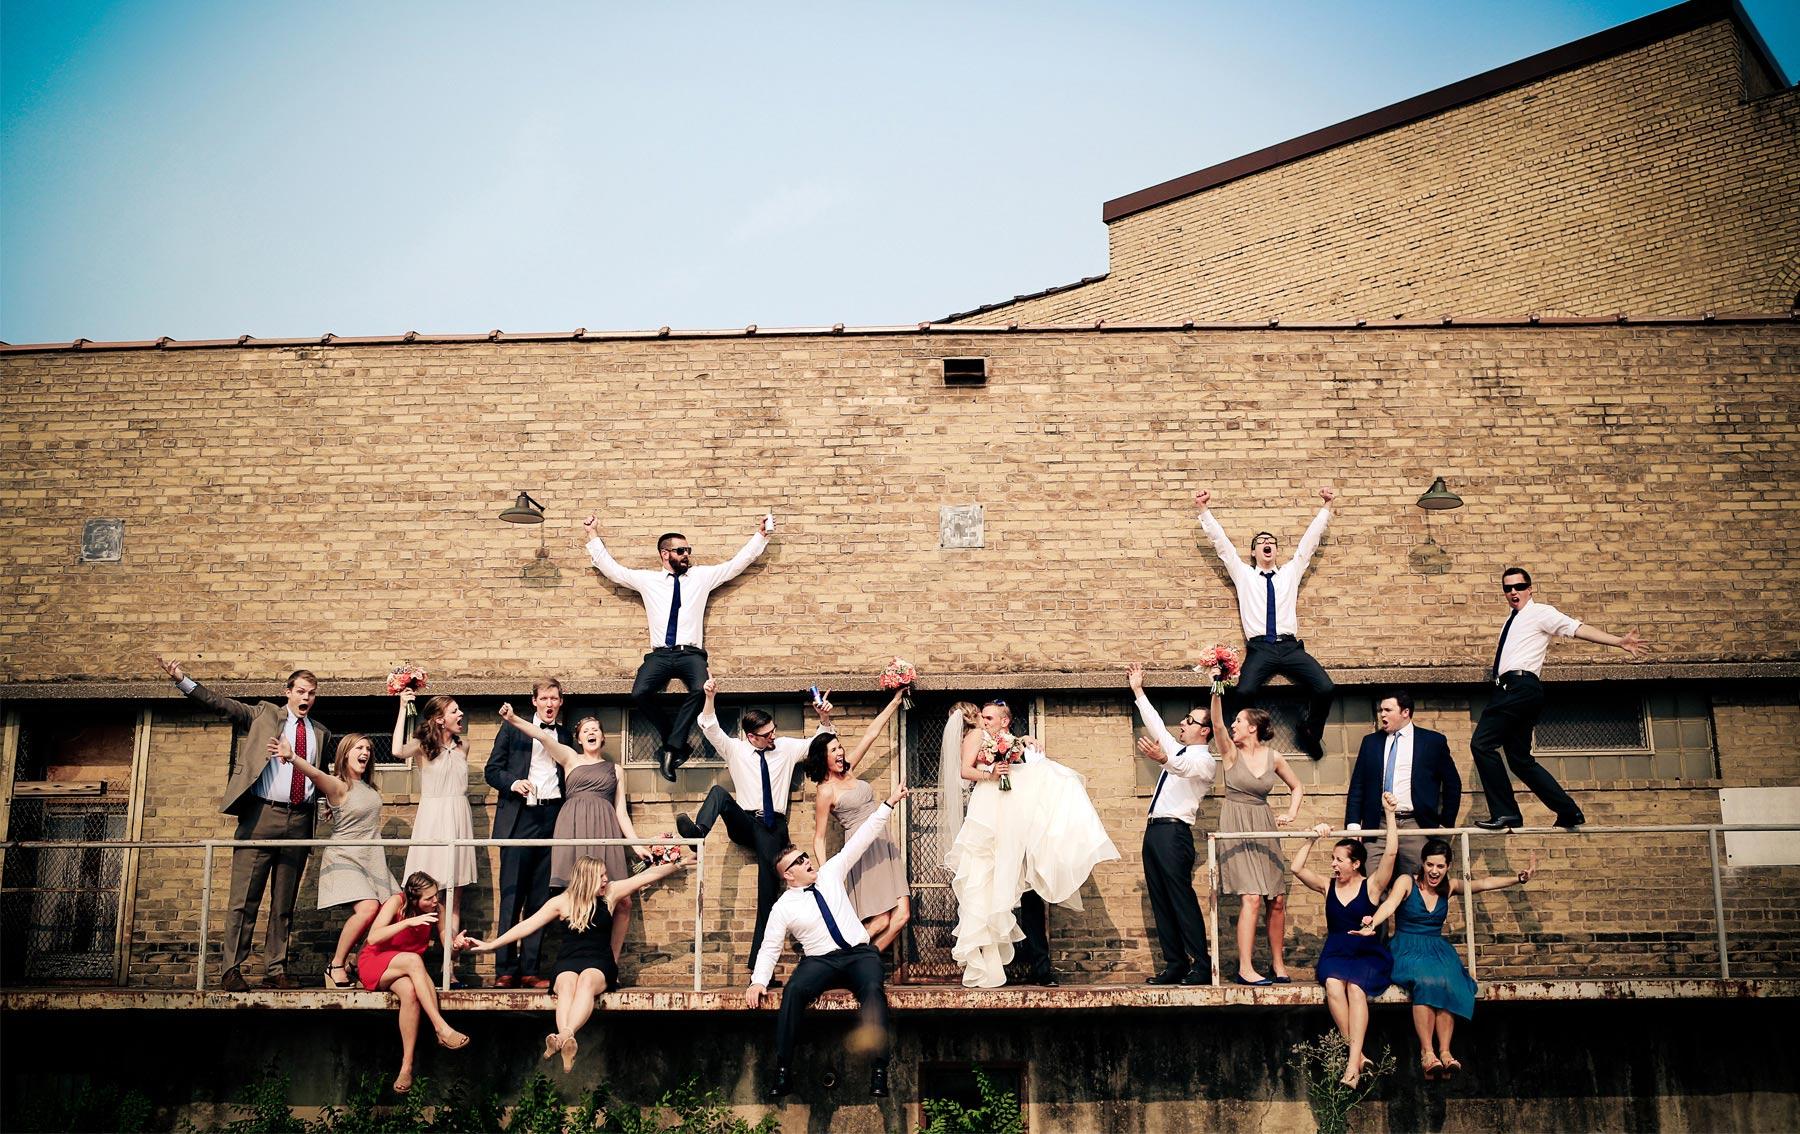 11-Minneapolis-Minnesota-Wedding-Photography-by-Vick-Photography-Wedding-Party-Group-Jess-&-Jake.jpg